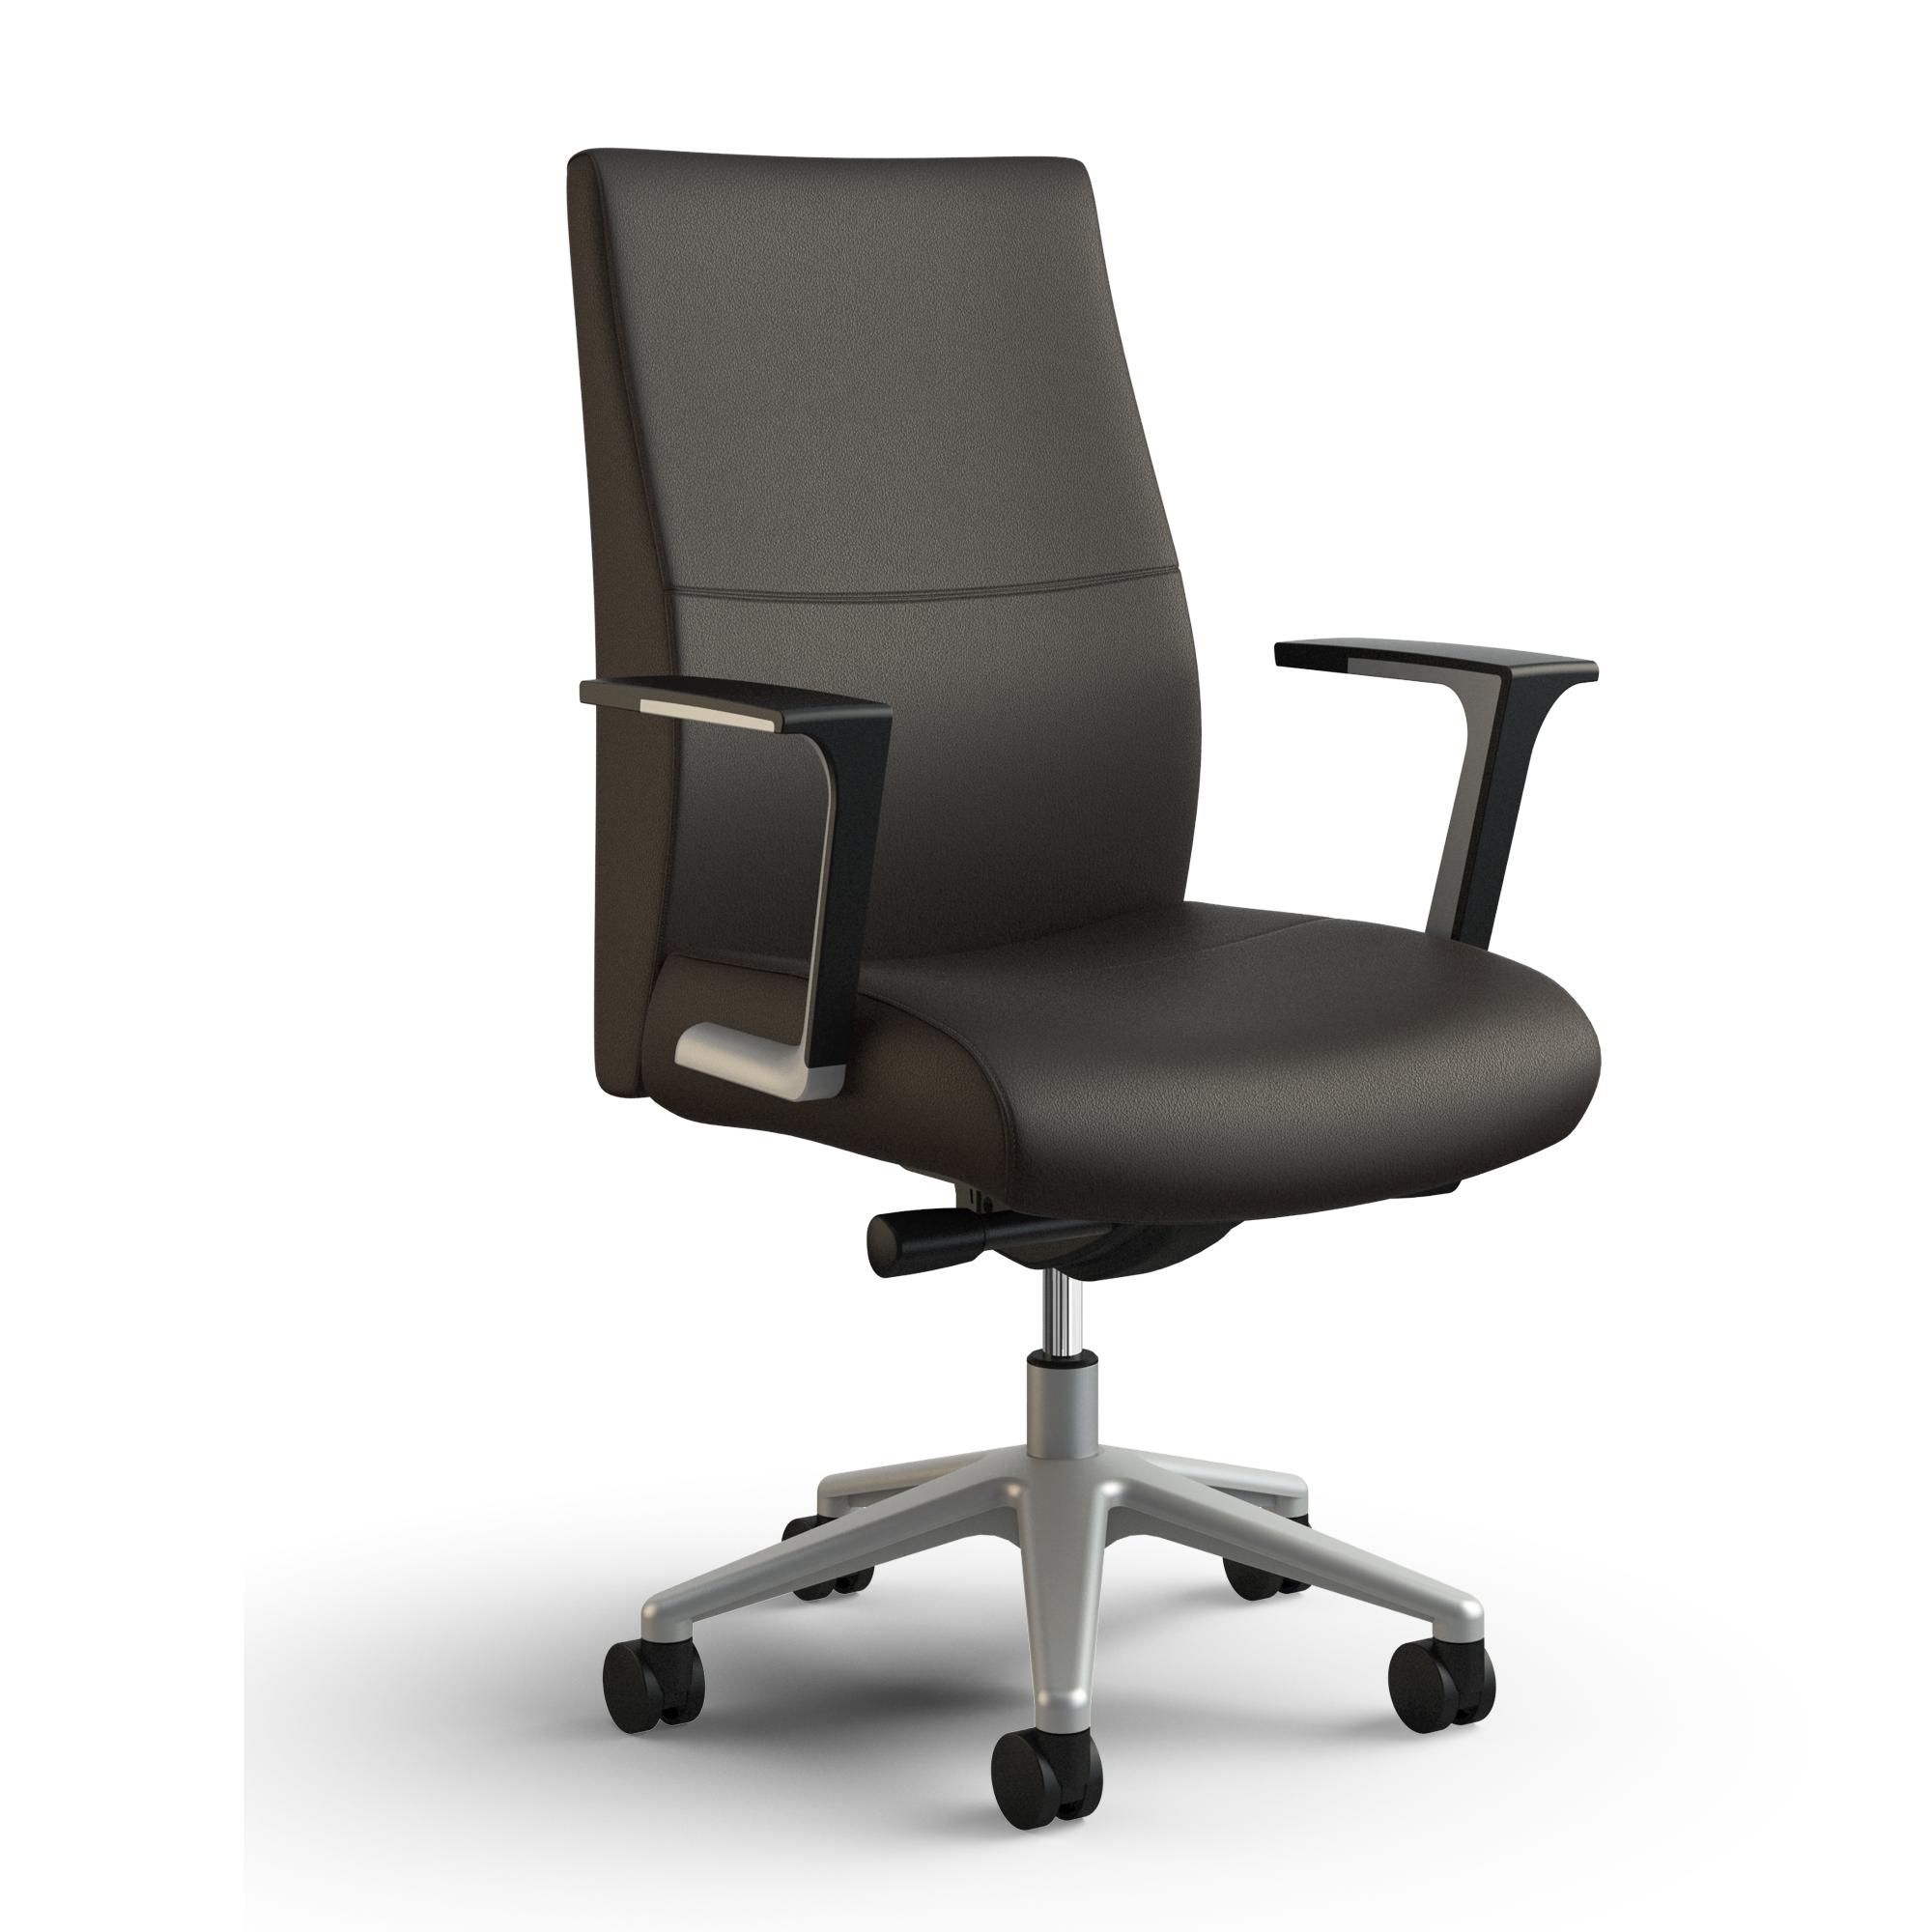 SitOnIt Prava Mid Back Common Sense Office Furniture : sitprava011 from www.commonsenseof.com size 2000 x 2000 jpeg 927kB